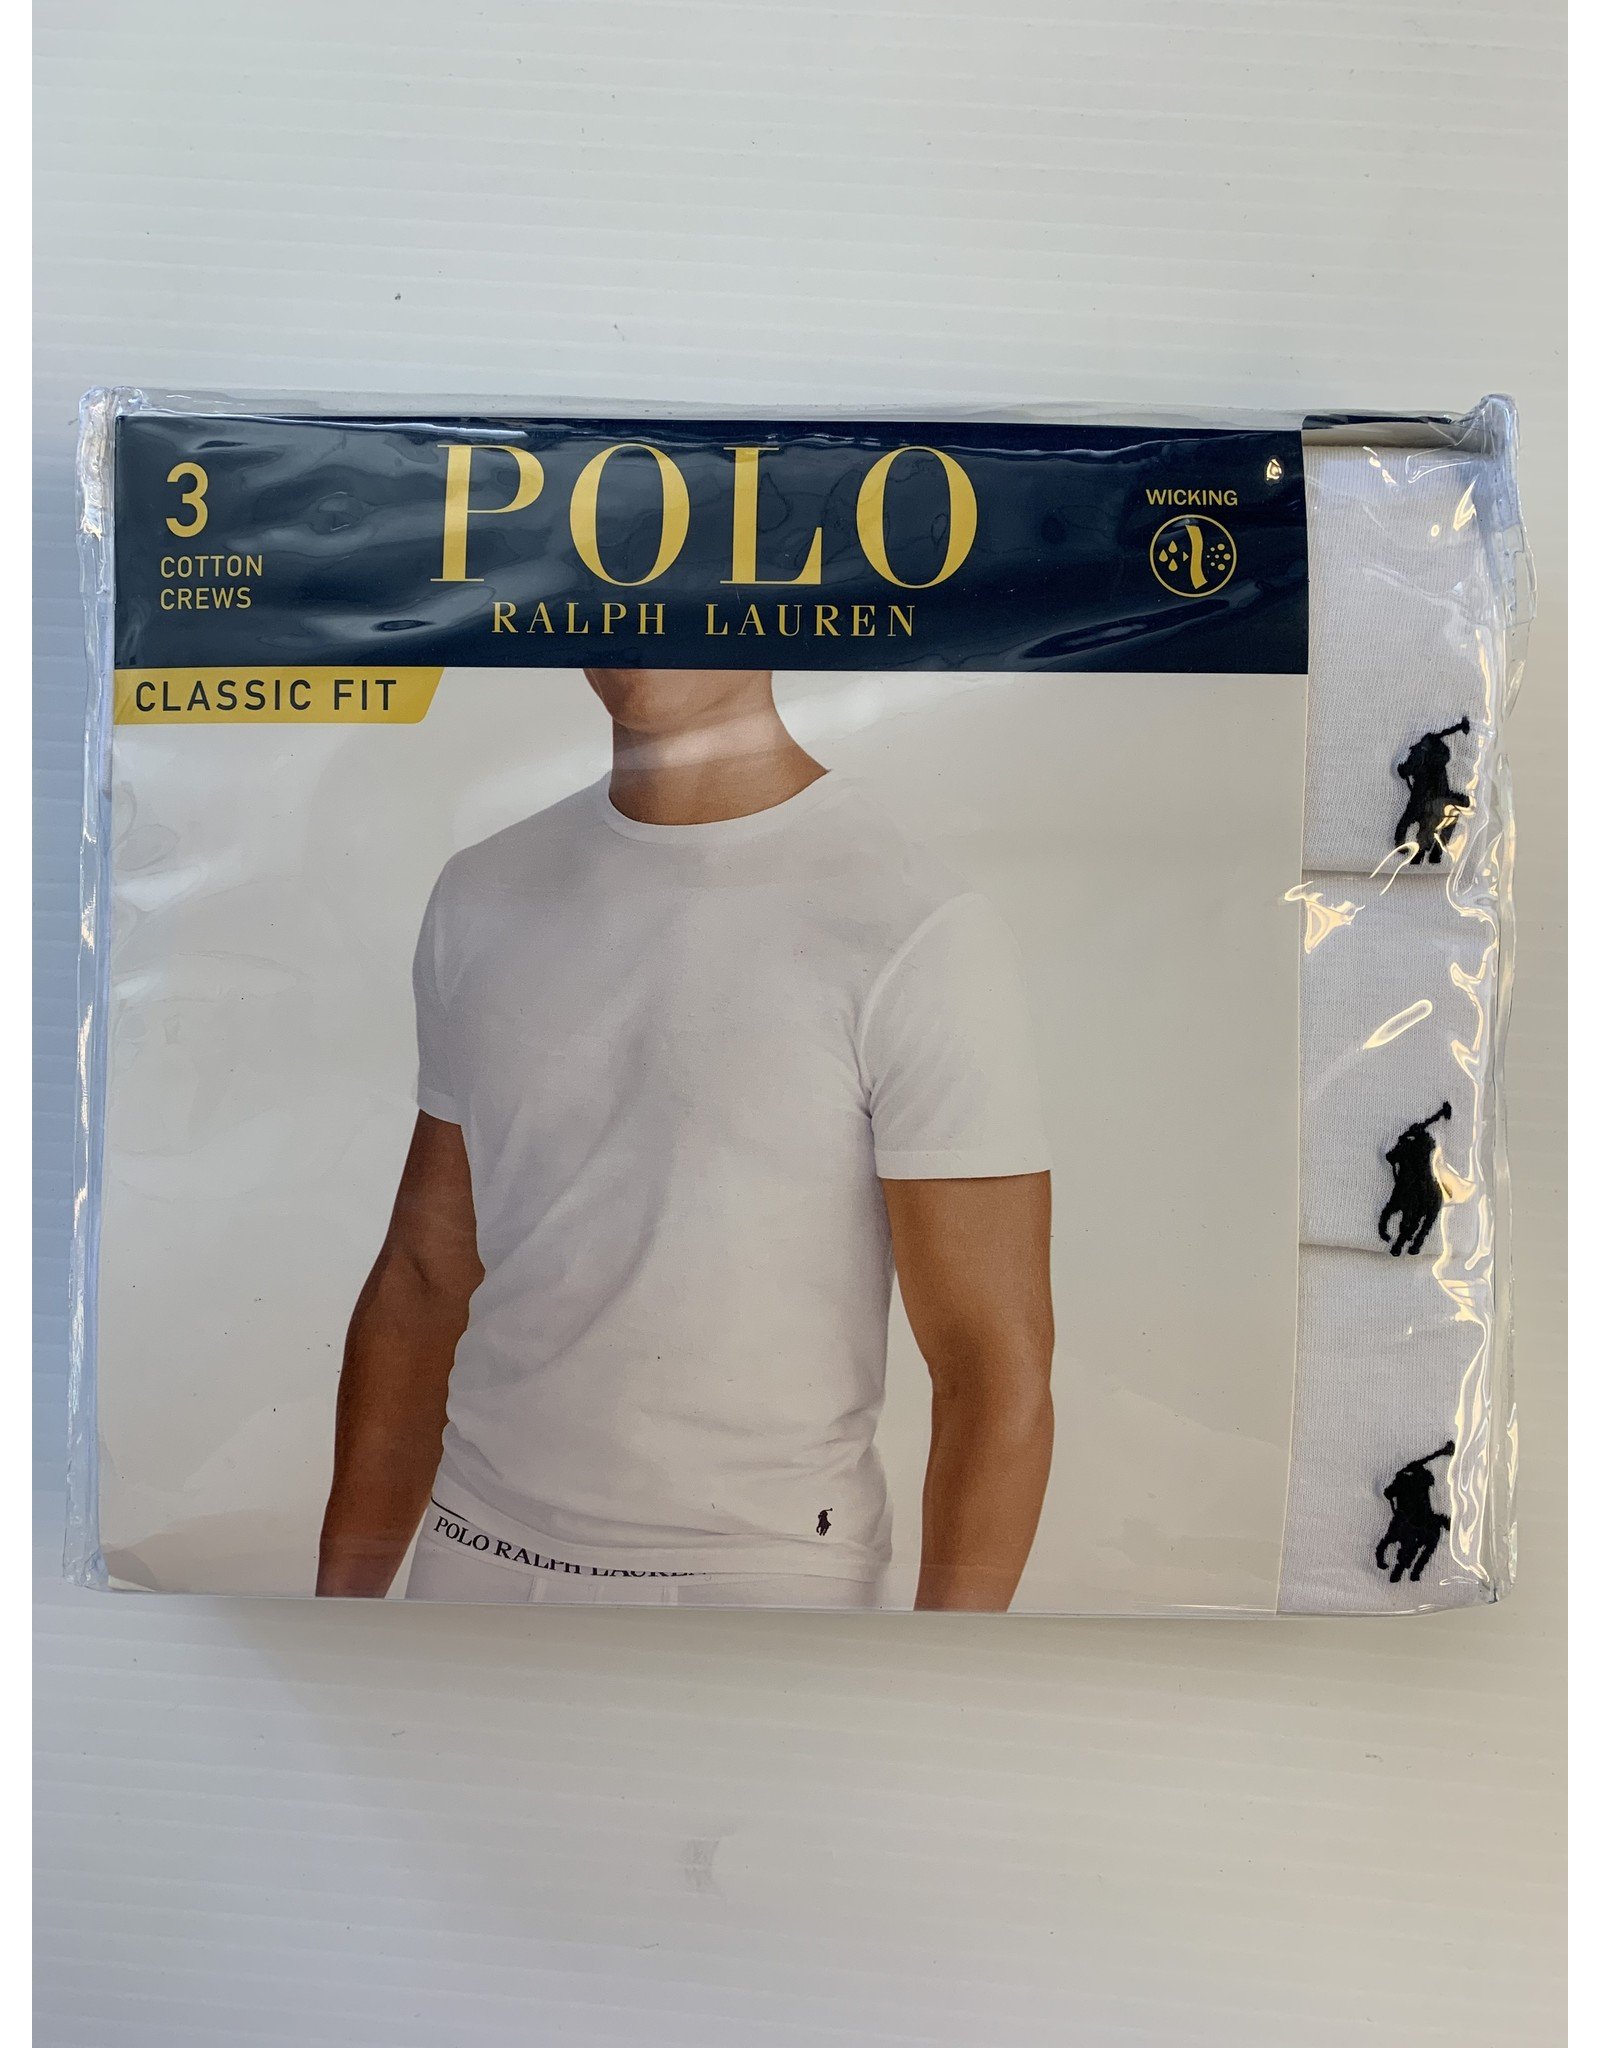 Polo Ralph Lauren Polo Ralph Lauren Men's Classic Crew Neck T-Shirts 3-Pack